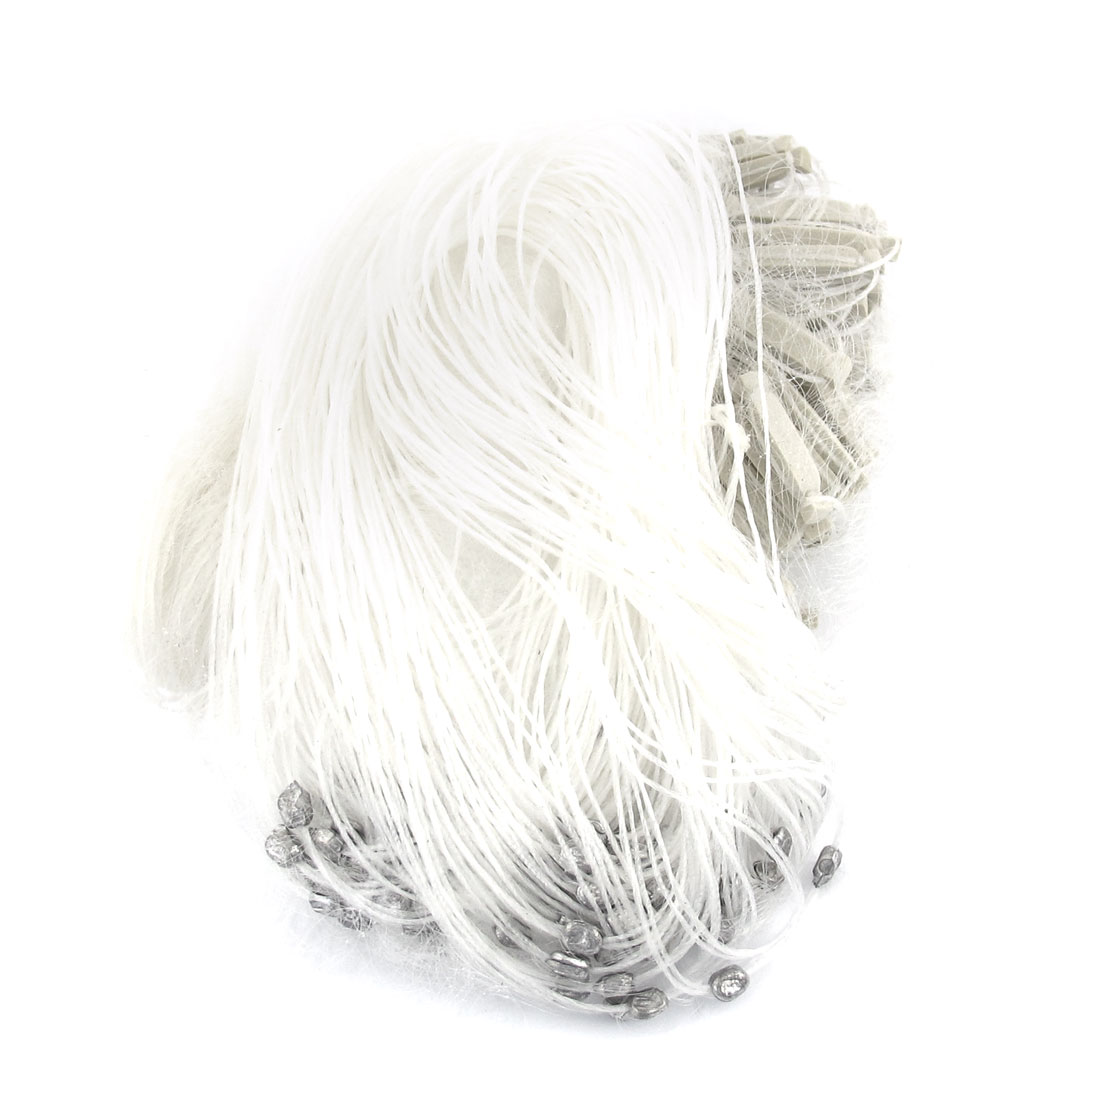 25m x 1.5m Fishing Fish Gill Monofilament Net Mesh White w Floats